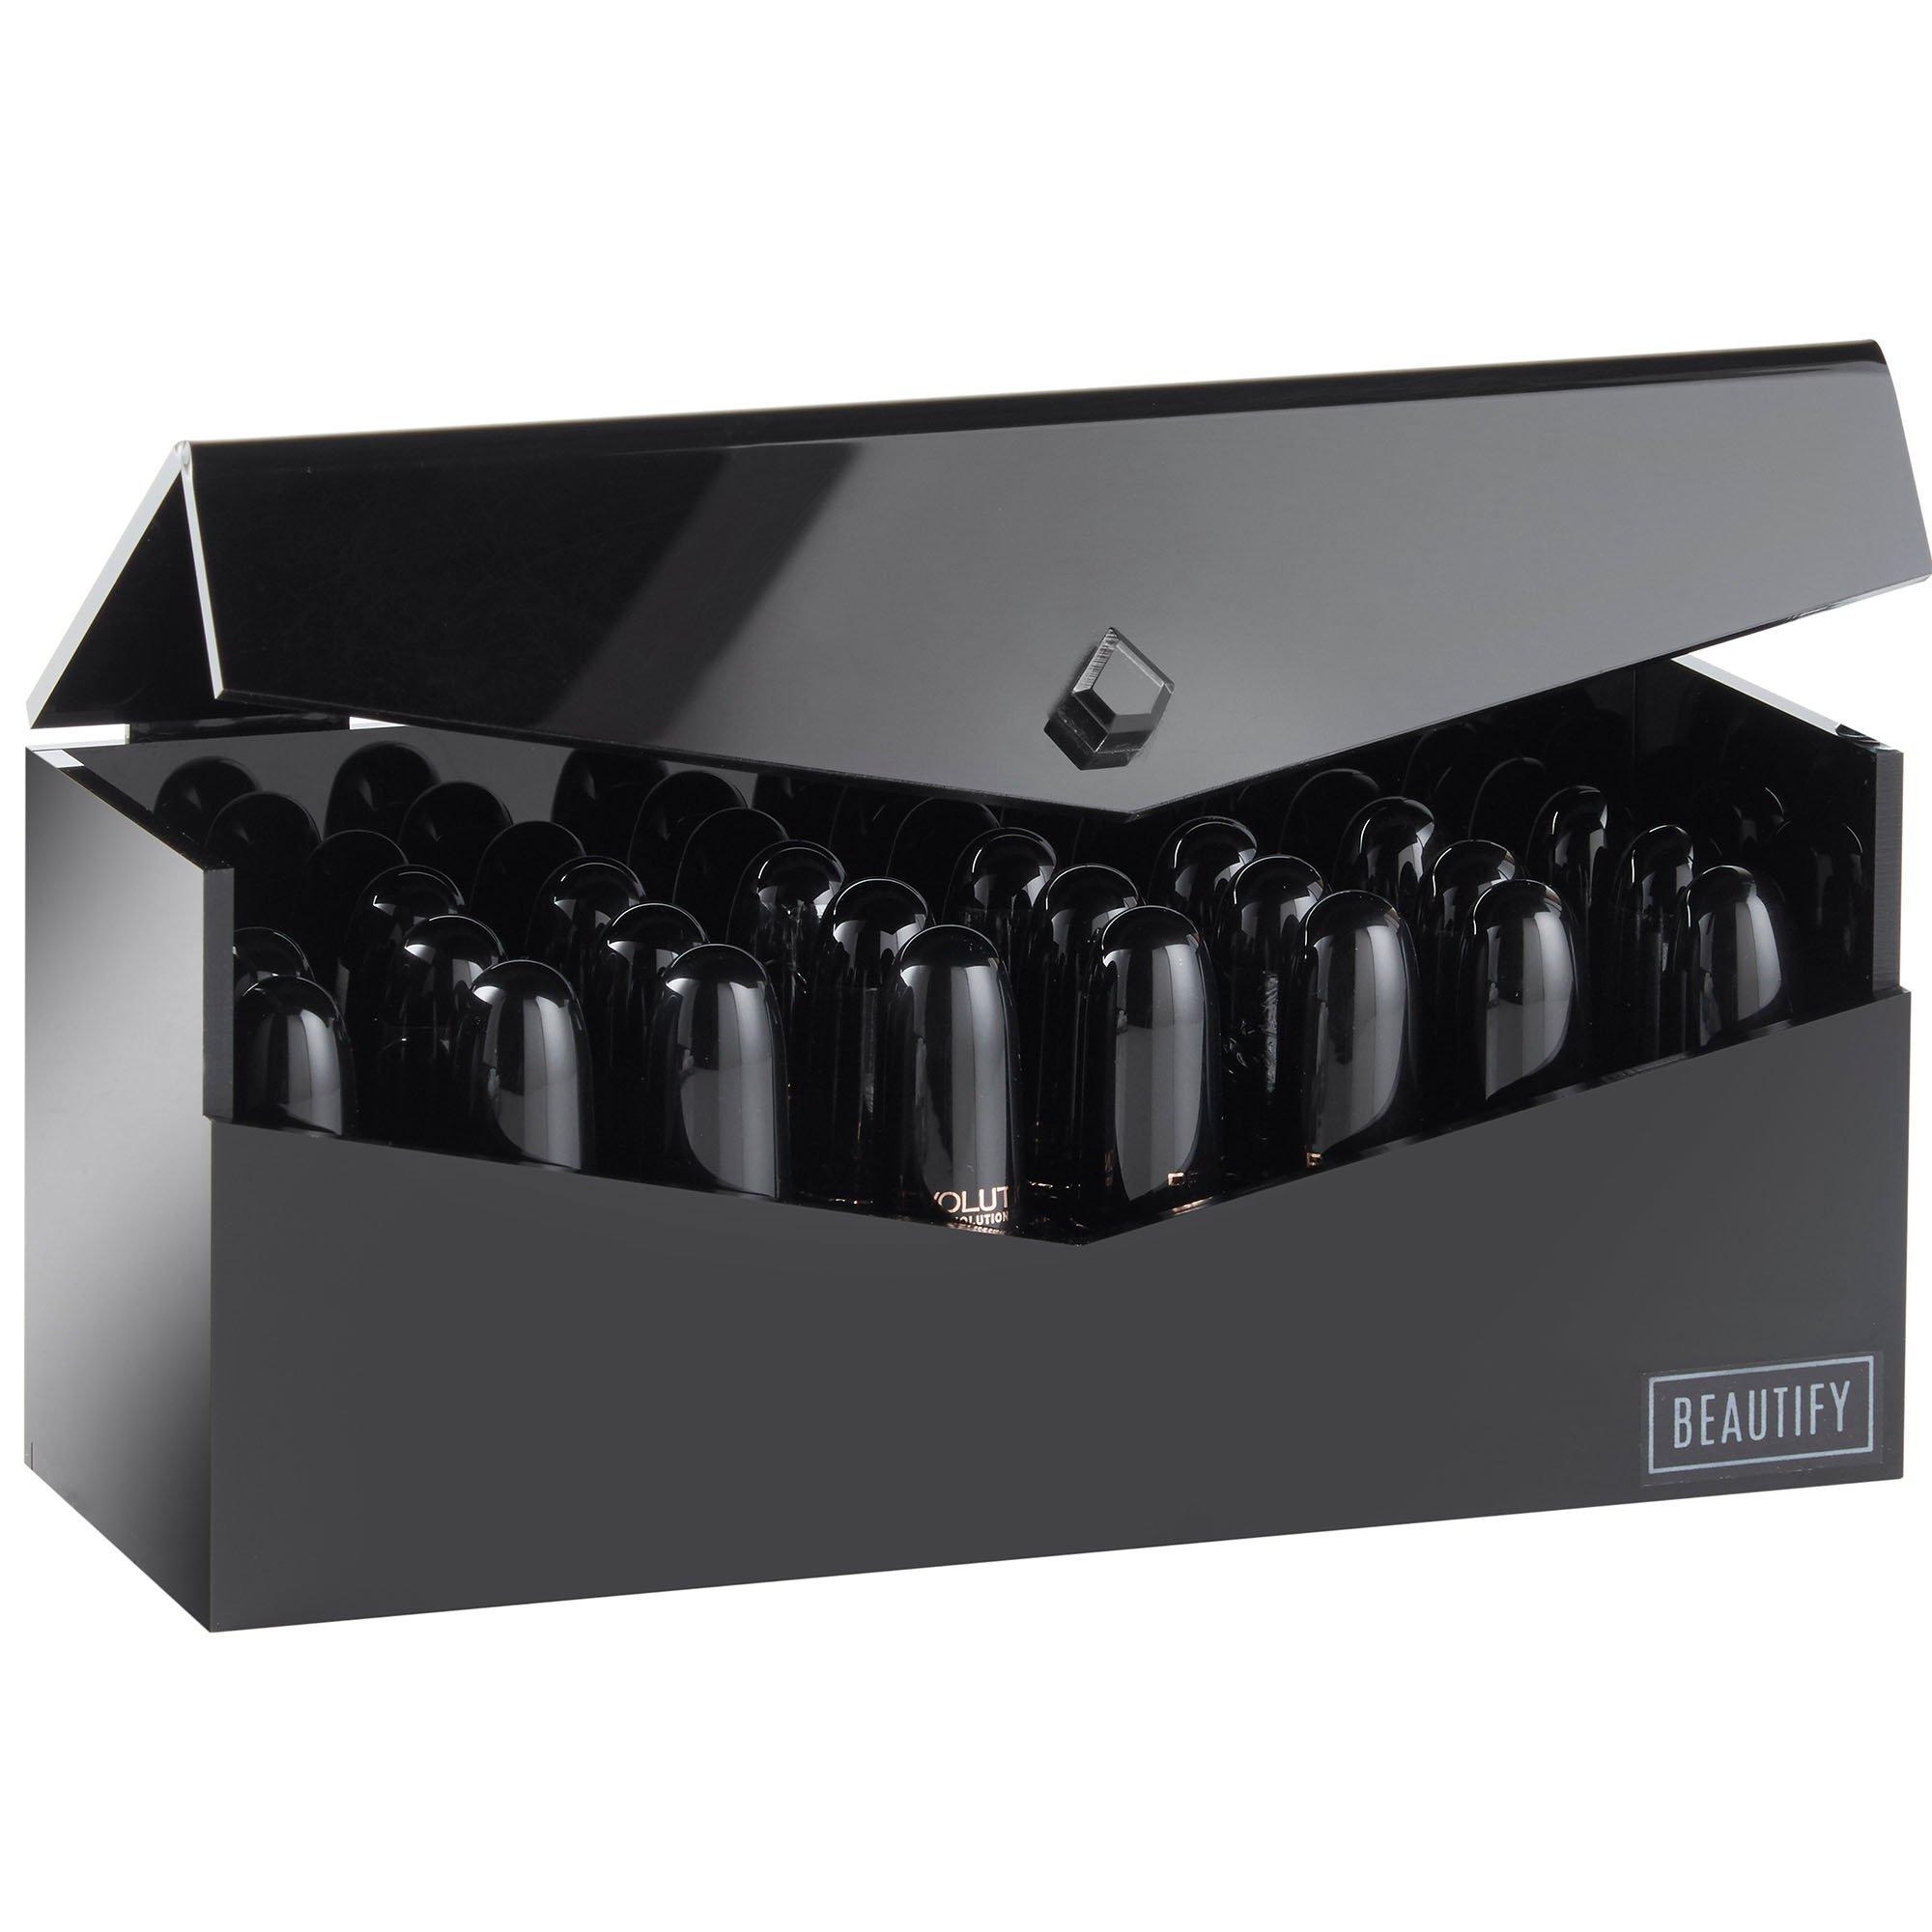 Beautify Black Acrylic 24 Slot Cosmetic Mac Lipstick Holder Case Storage Makeup Organizer with Lid